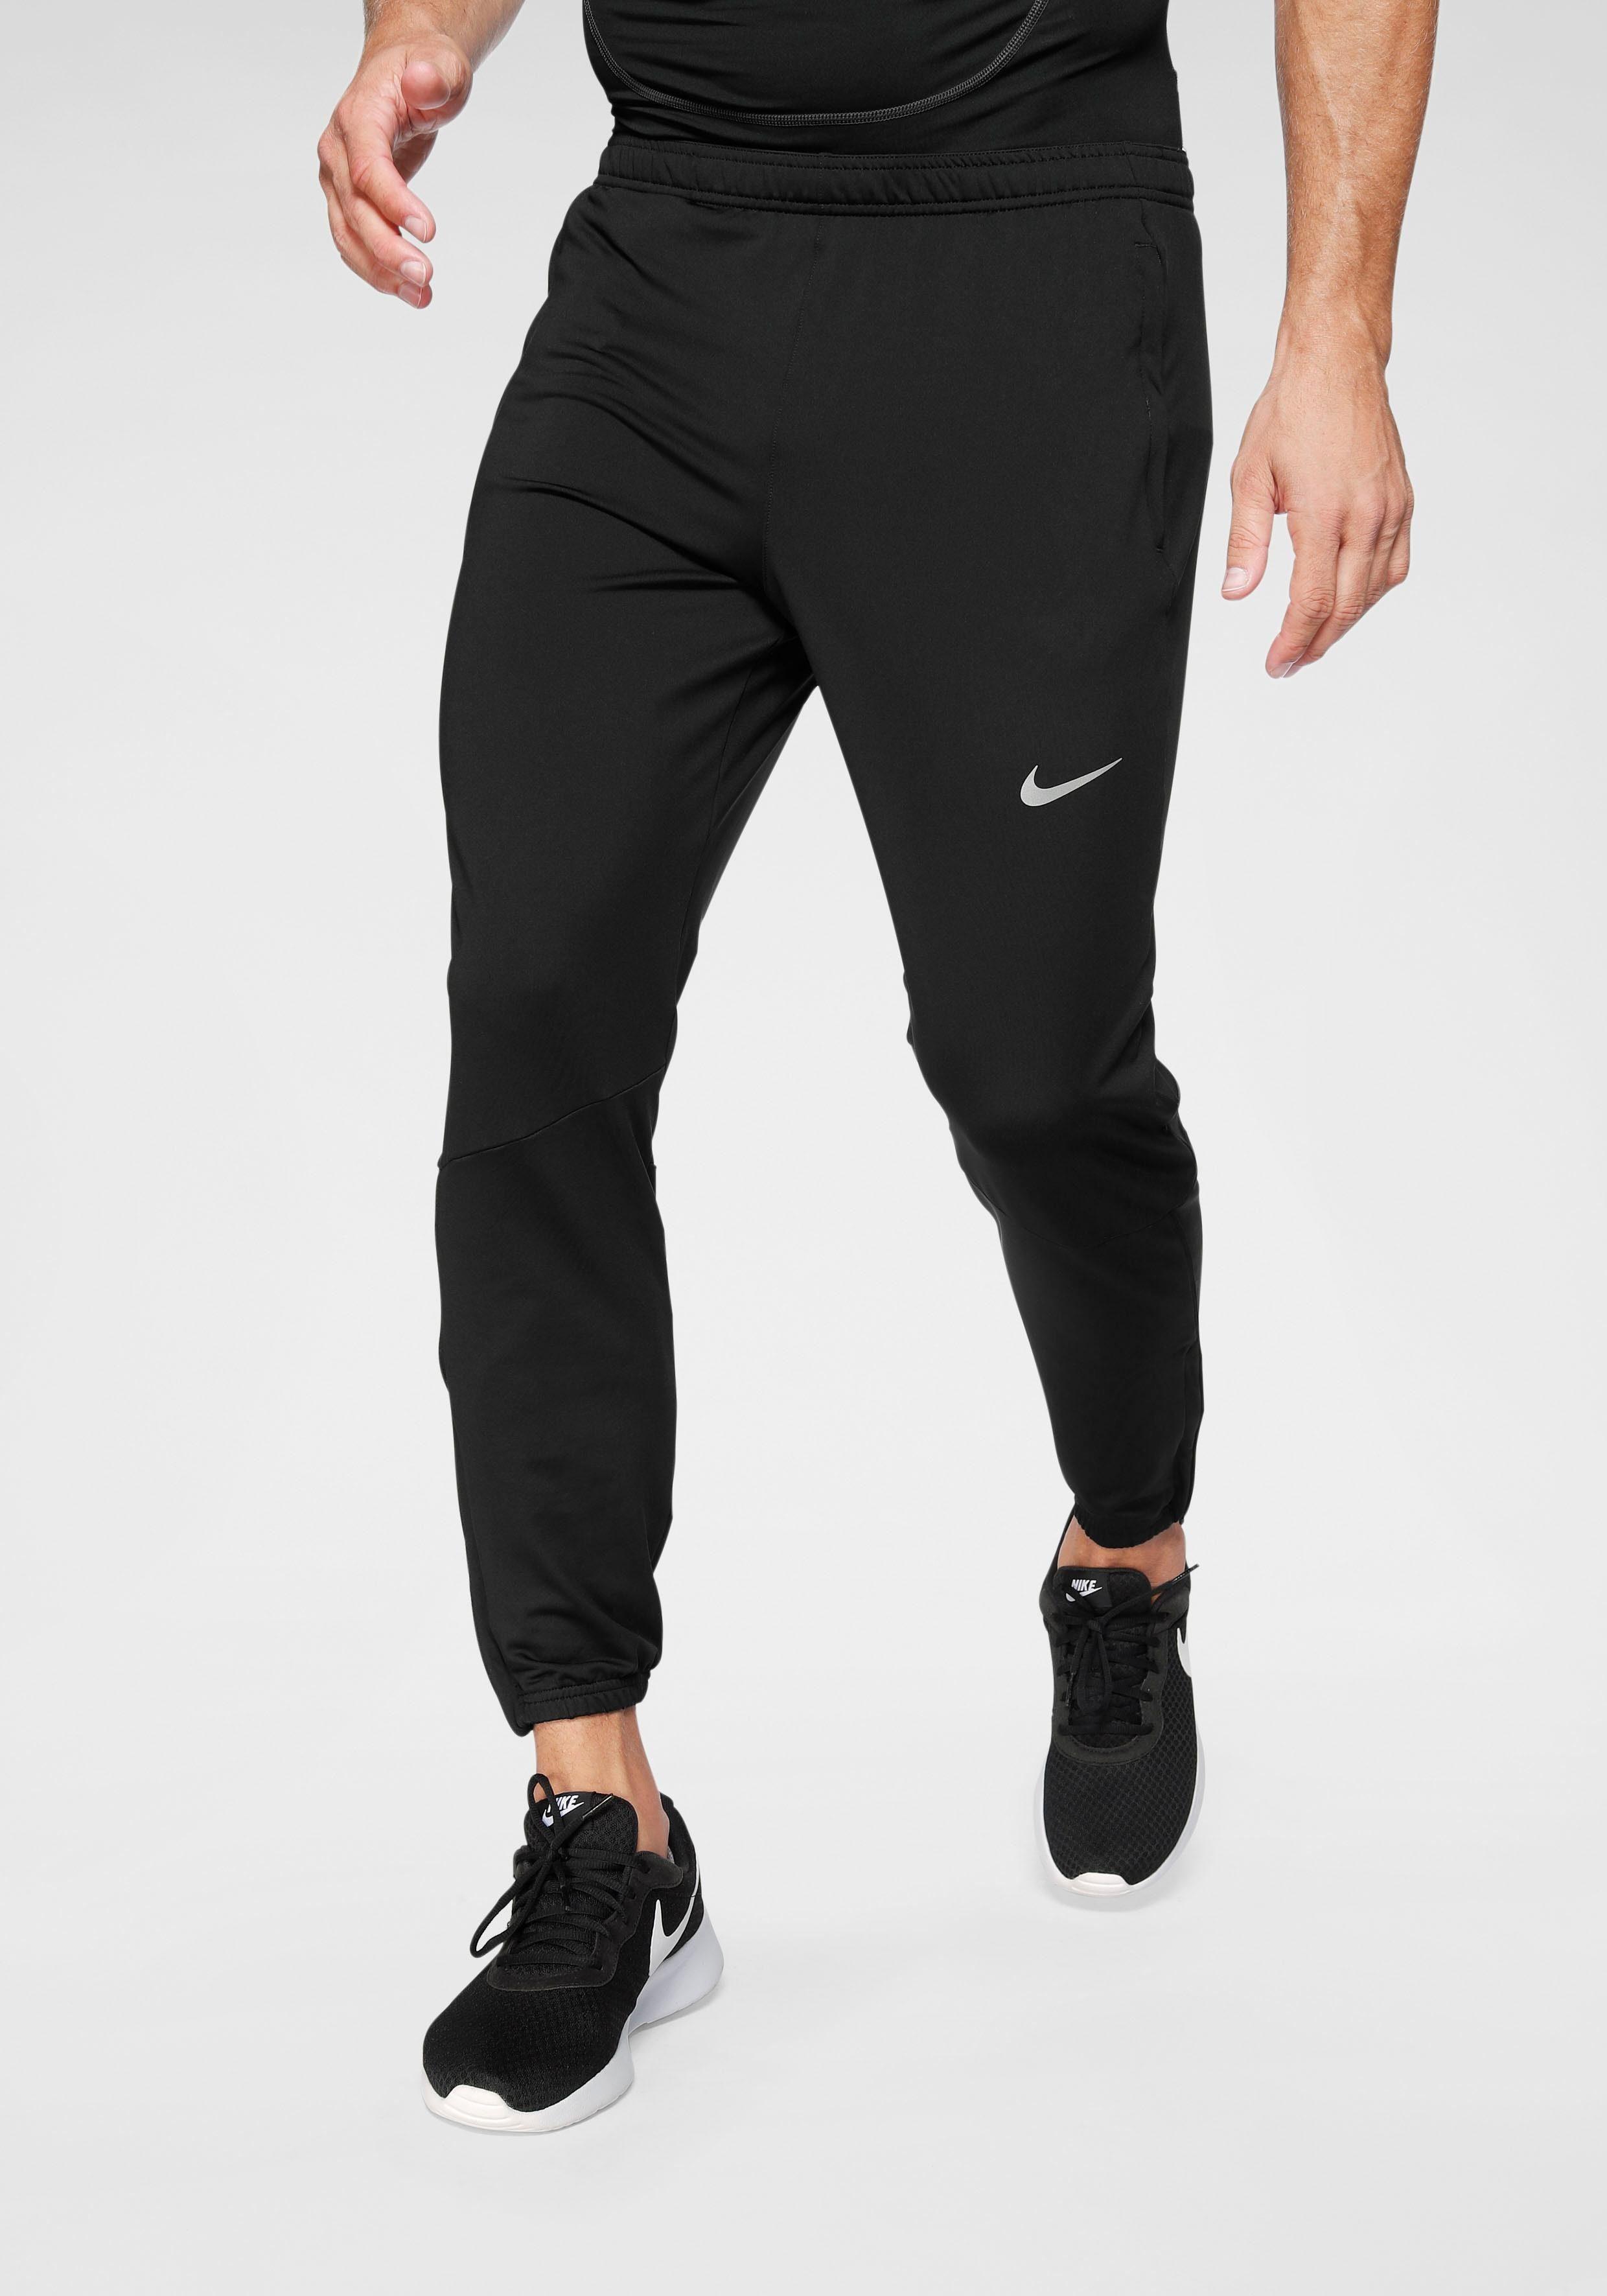 Nike Laufhose M NK PHNM ESSN KNIT PANT | Sportbekleidung > Sporthosen > Laufhosen | Nike